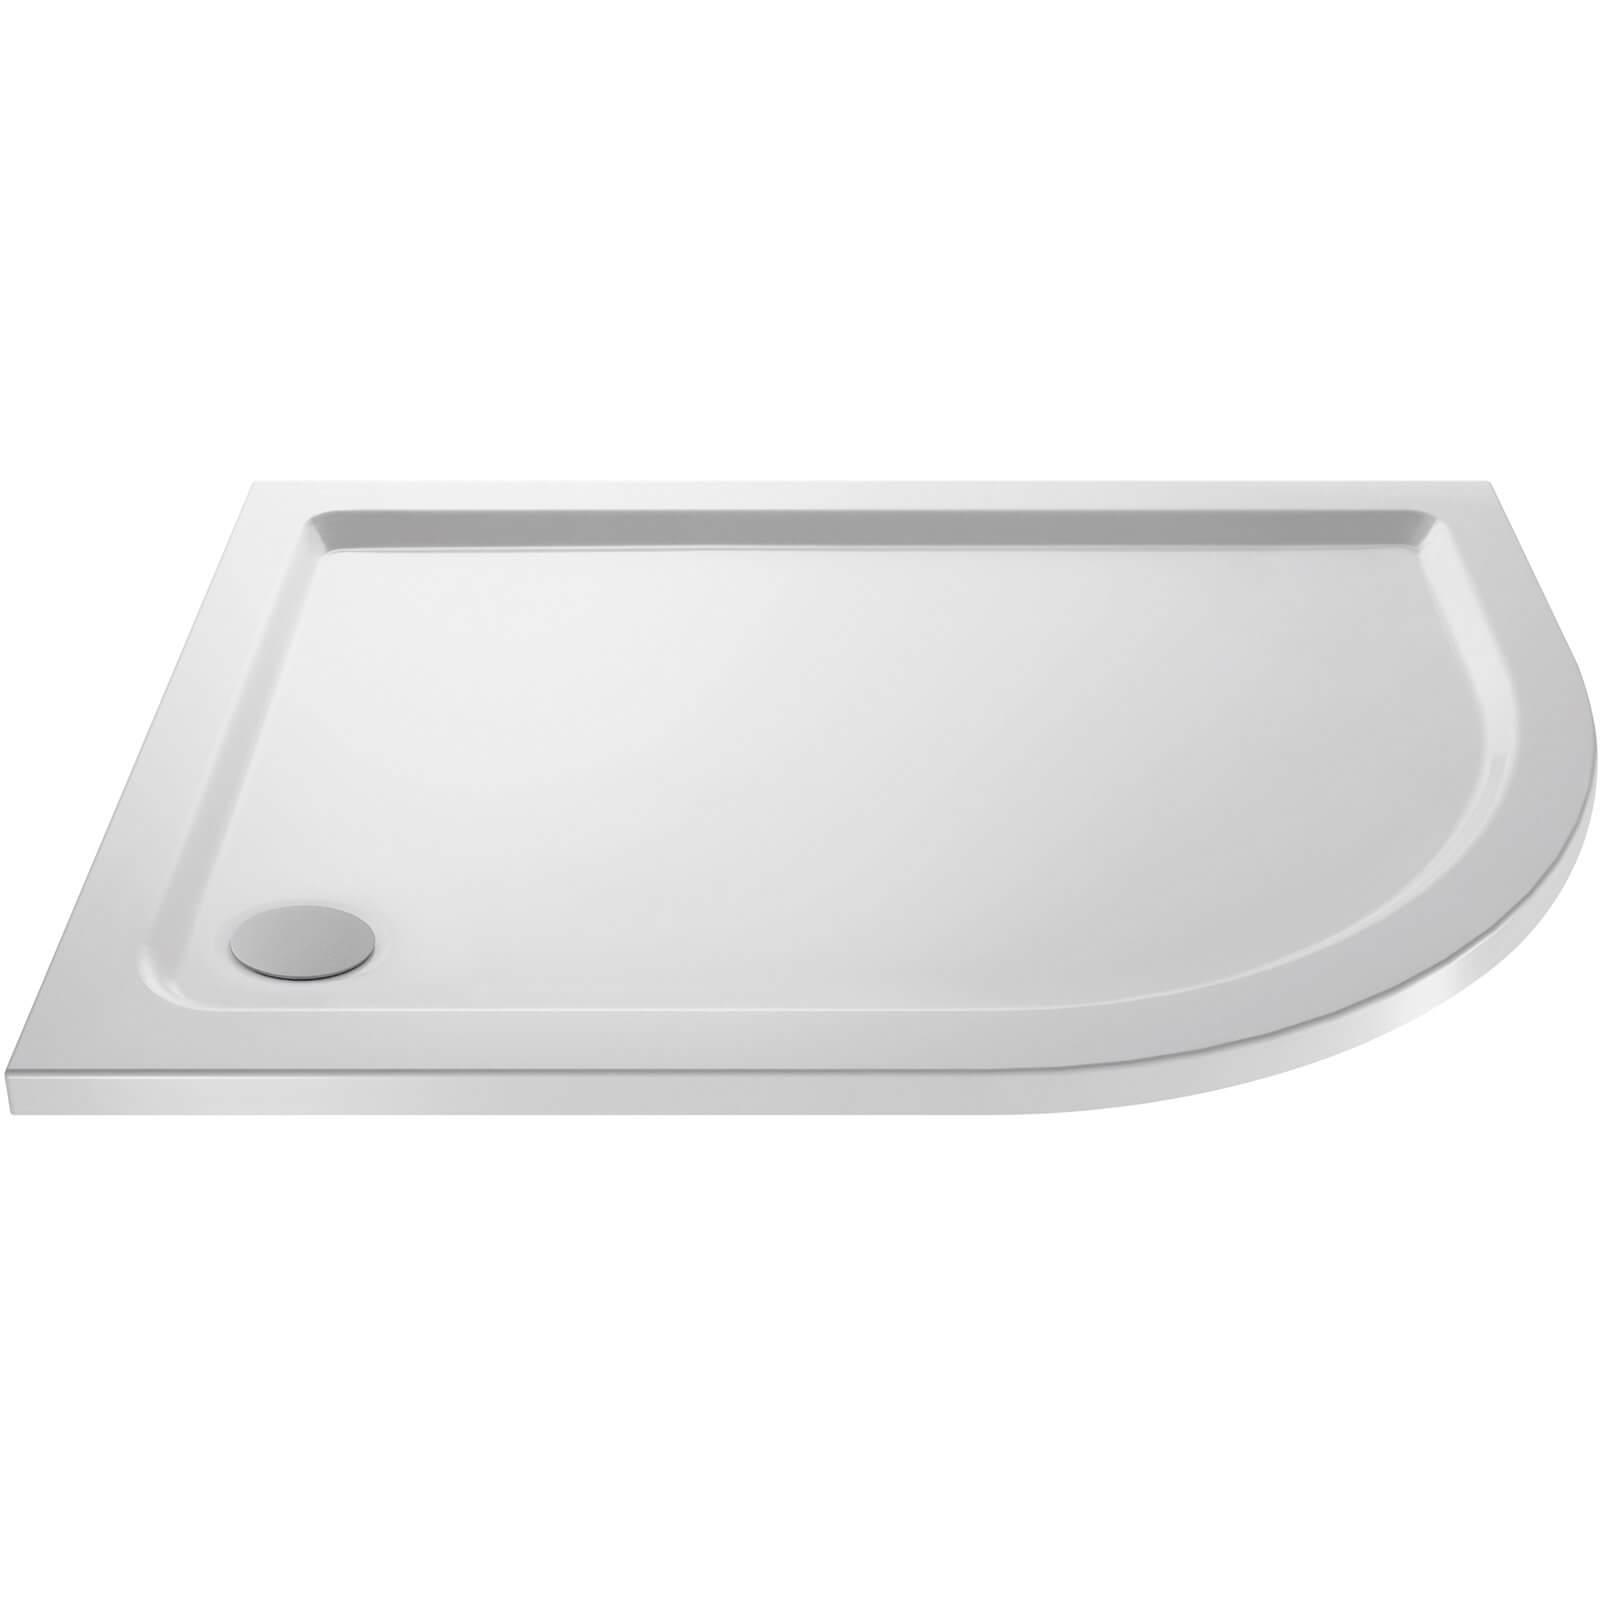 Balterley Right Hand Offset Quadrant Shower Tray - 1000 x 800mm